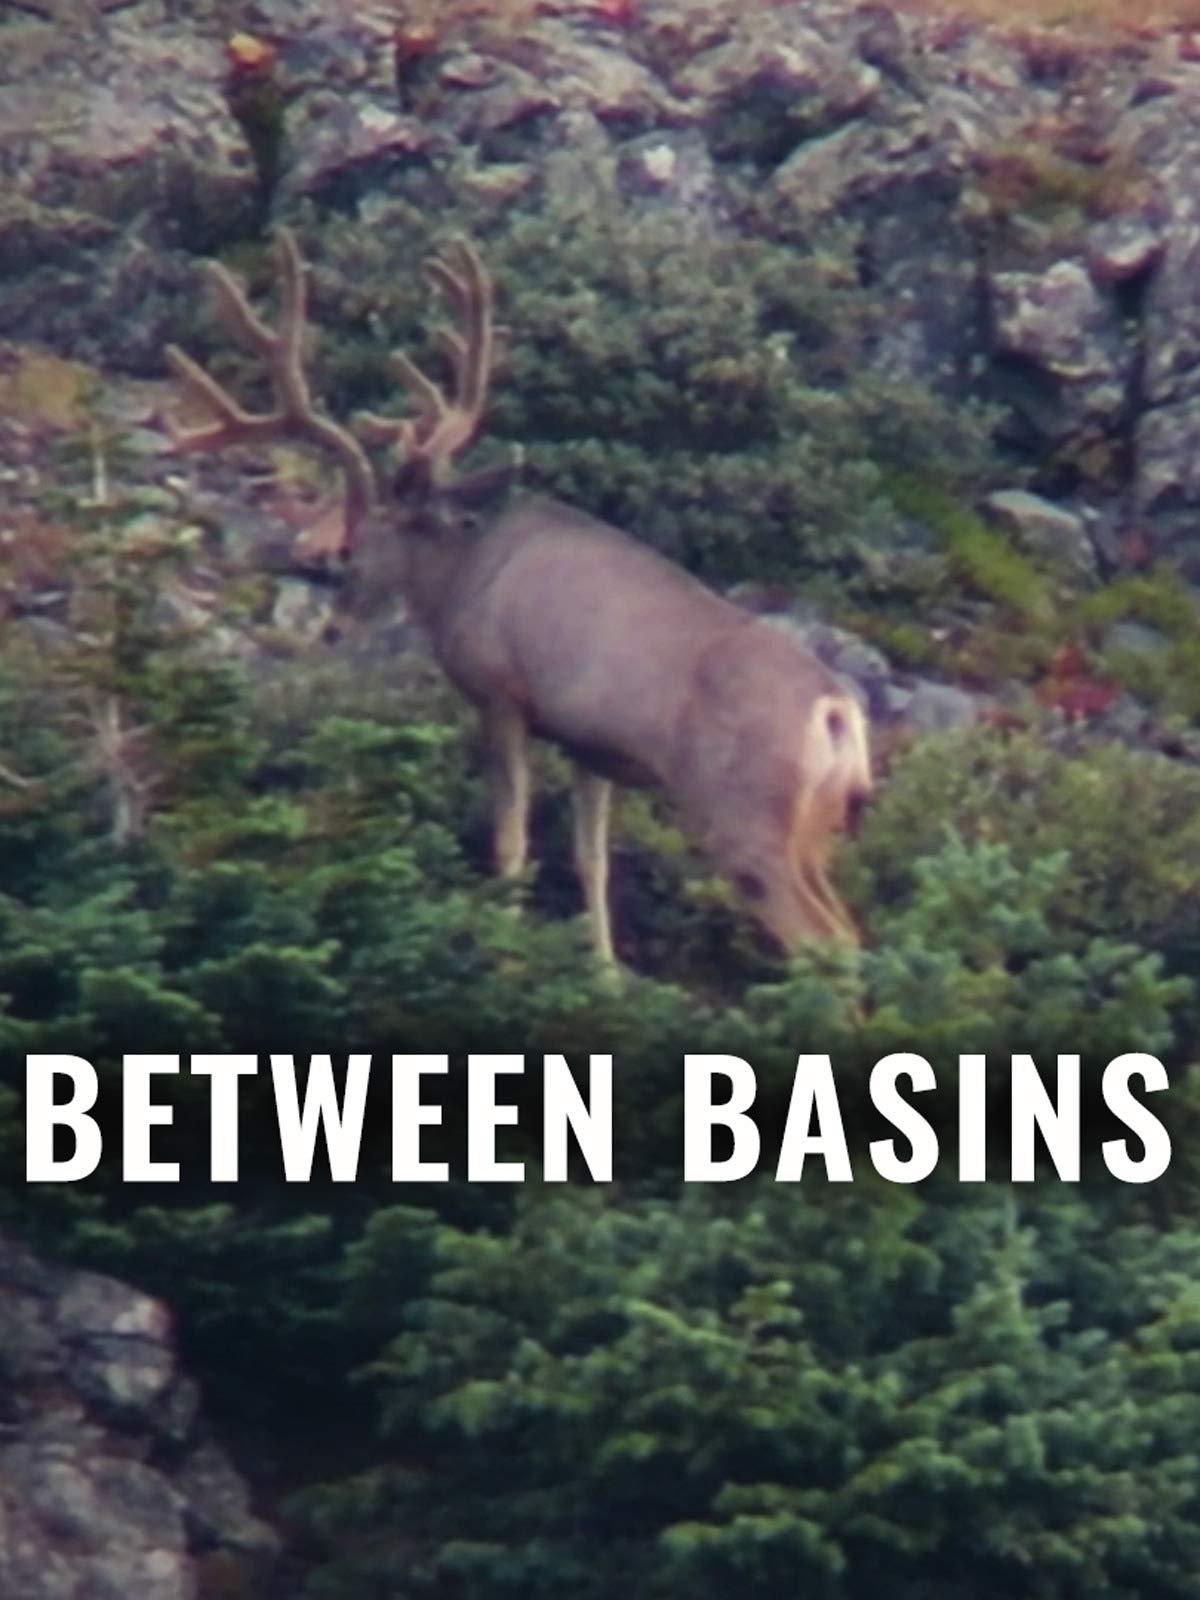 Between Basins